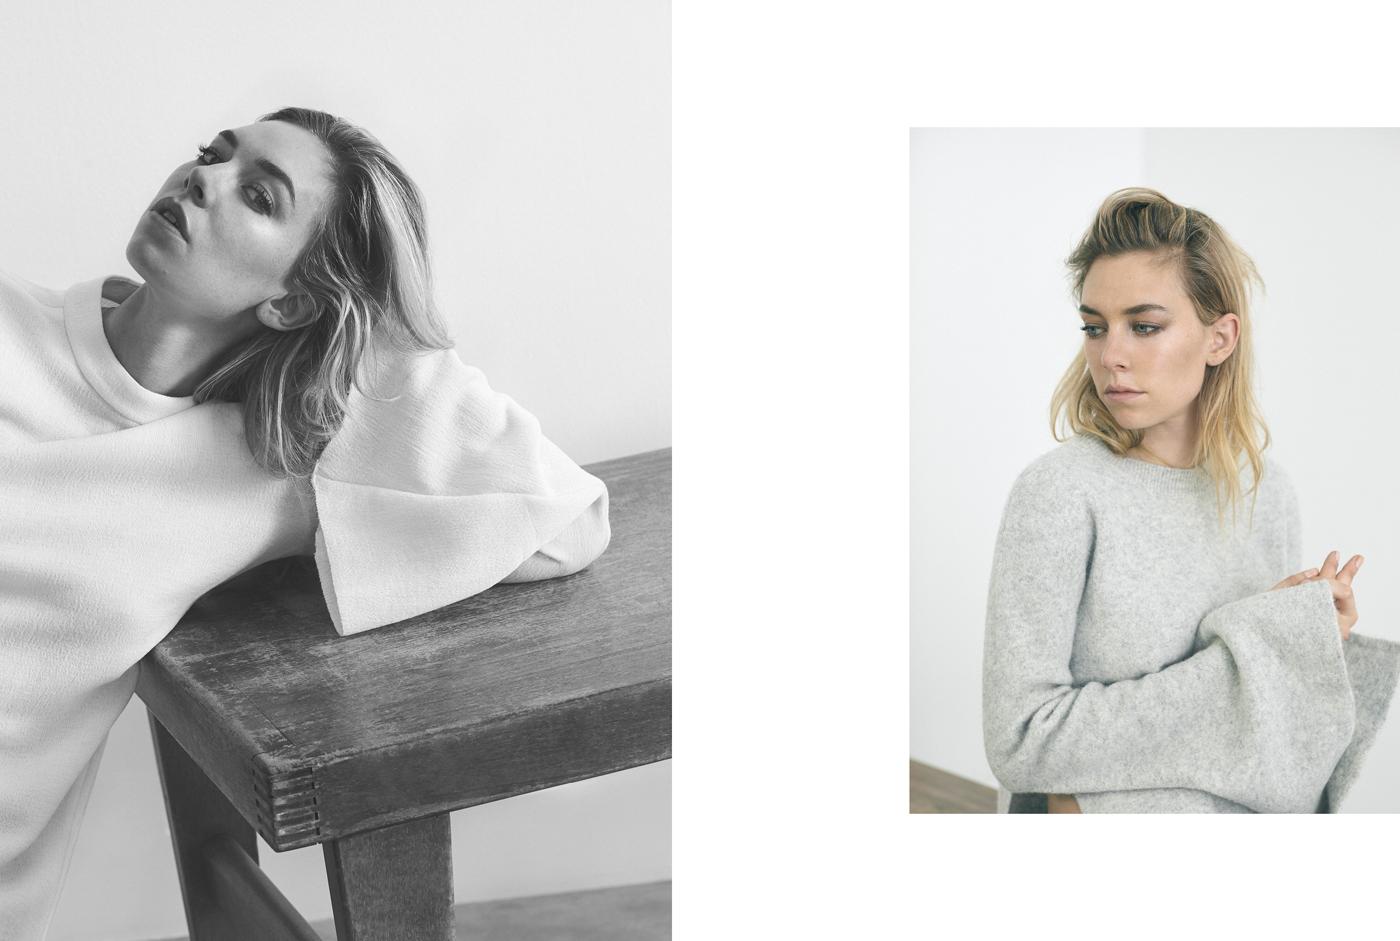 Left: Top by Ellery.Right: Sweater by Ellery.